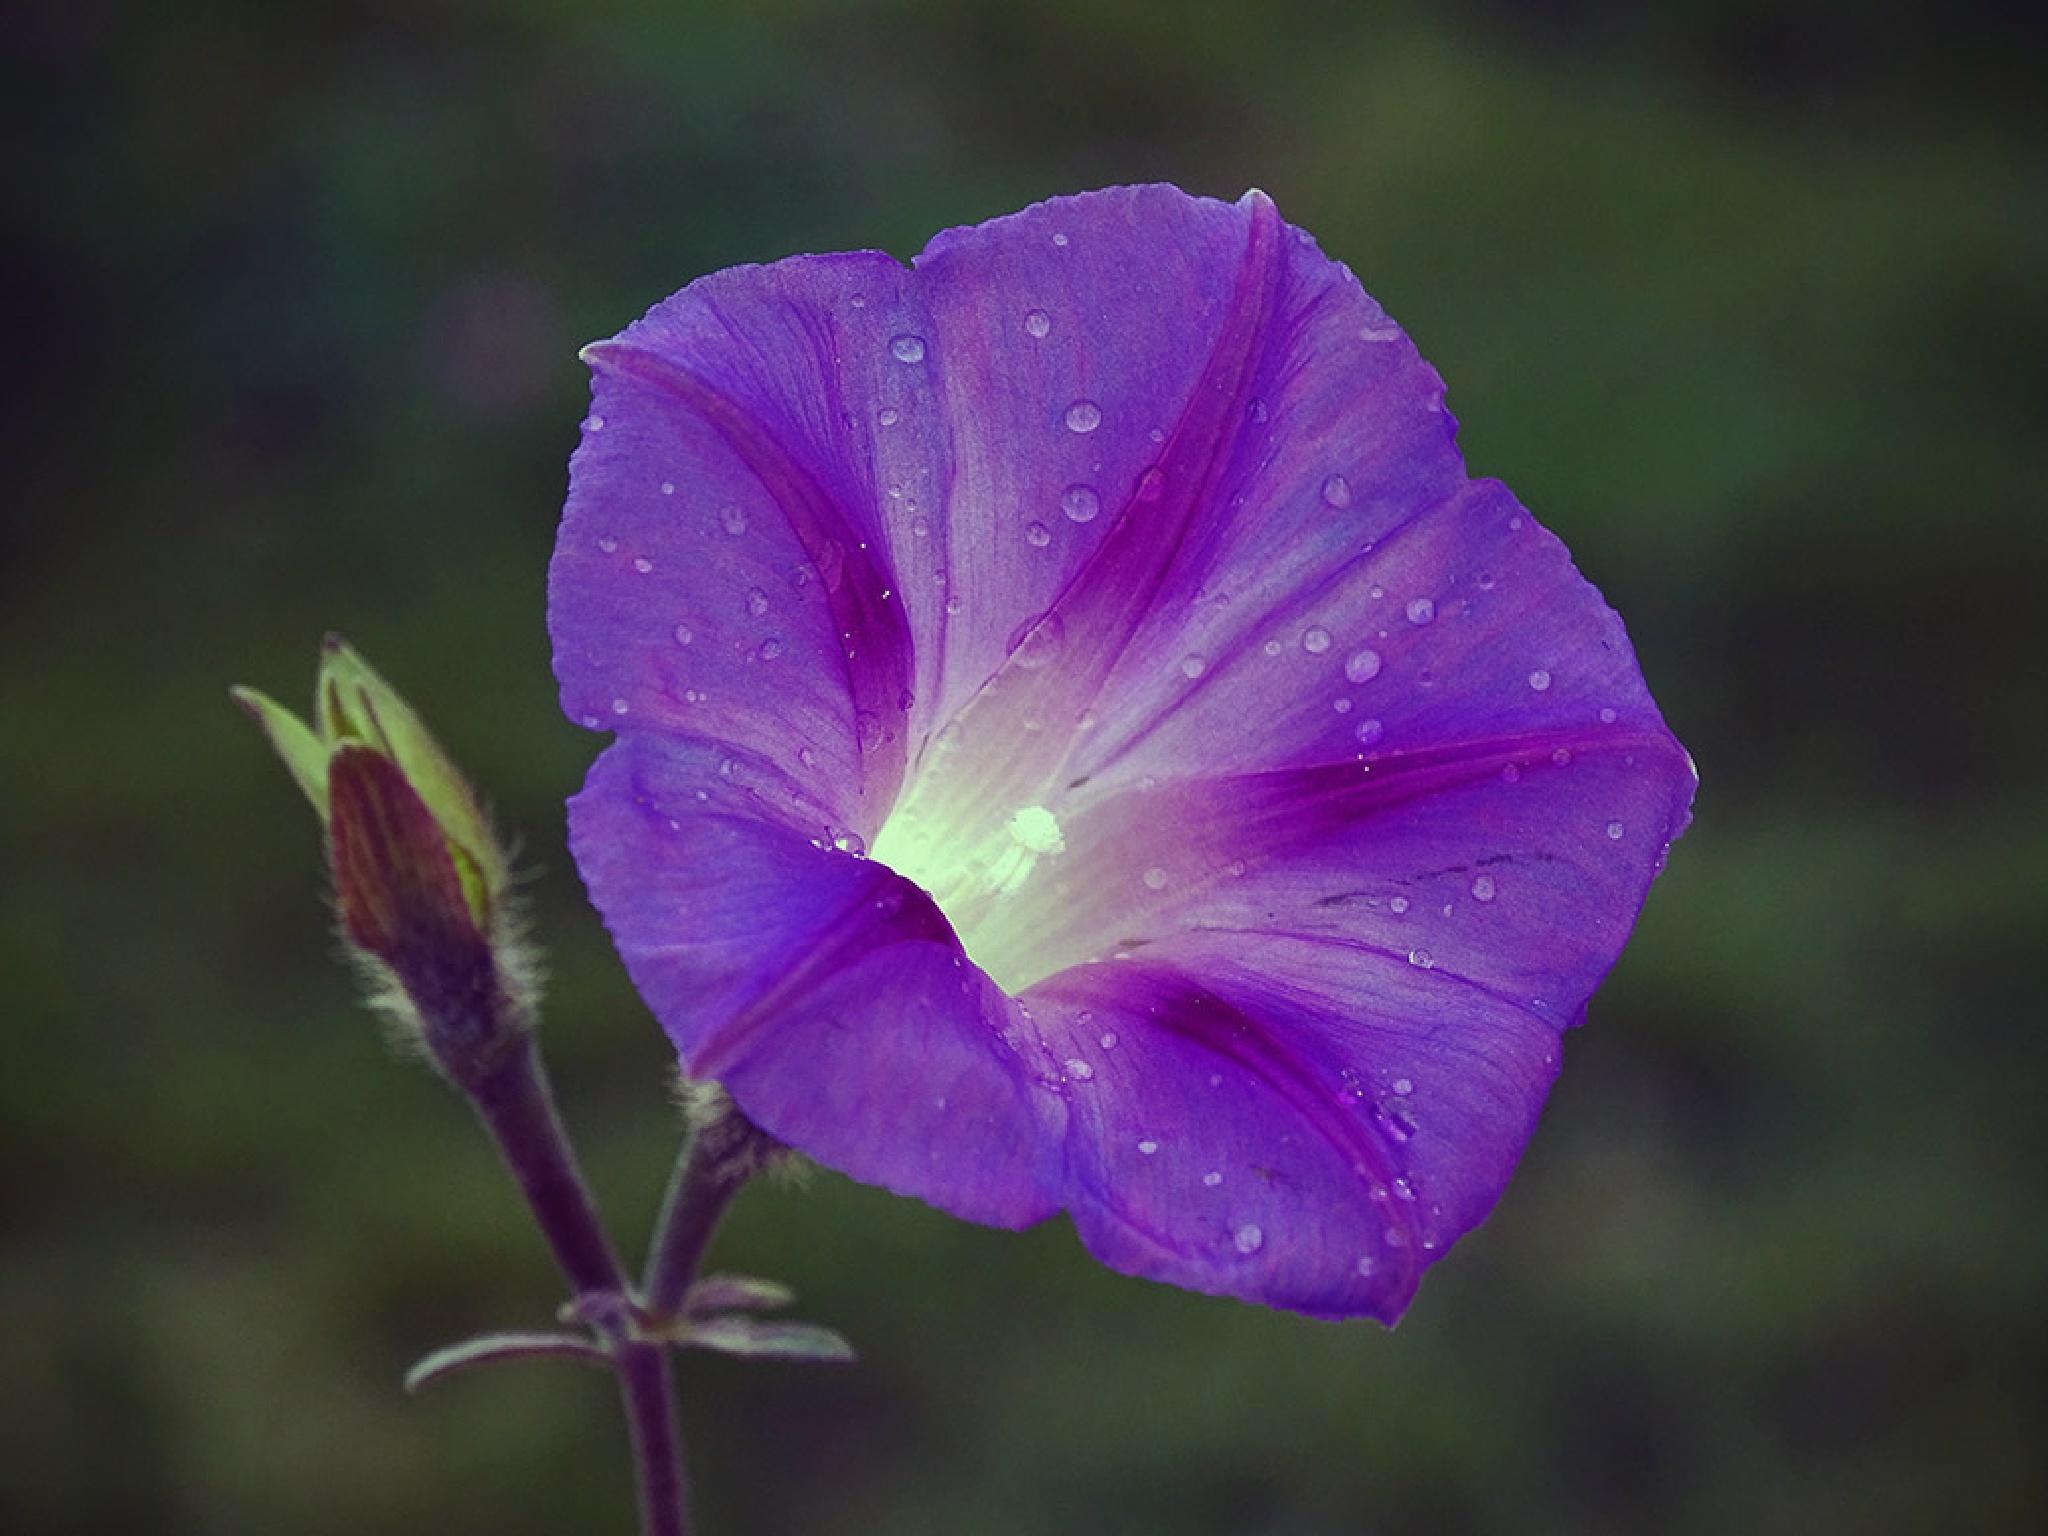 Morning flower by Jamal -Kurdistan